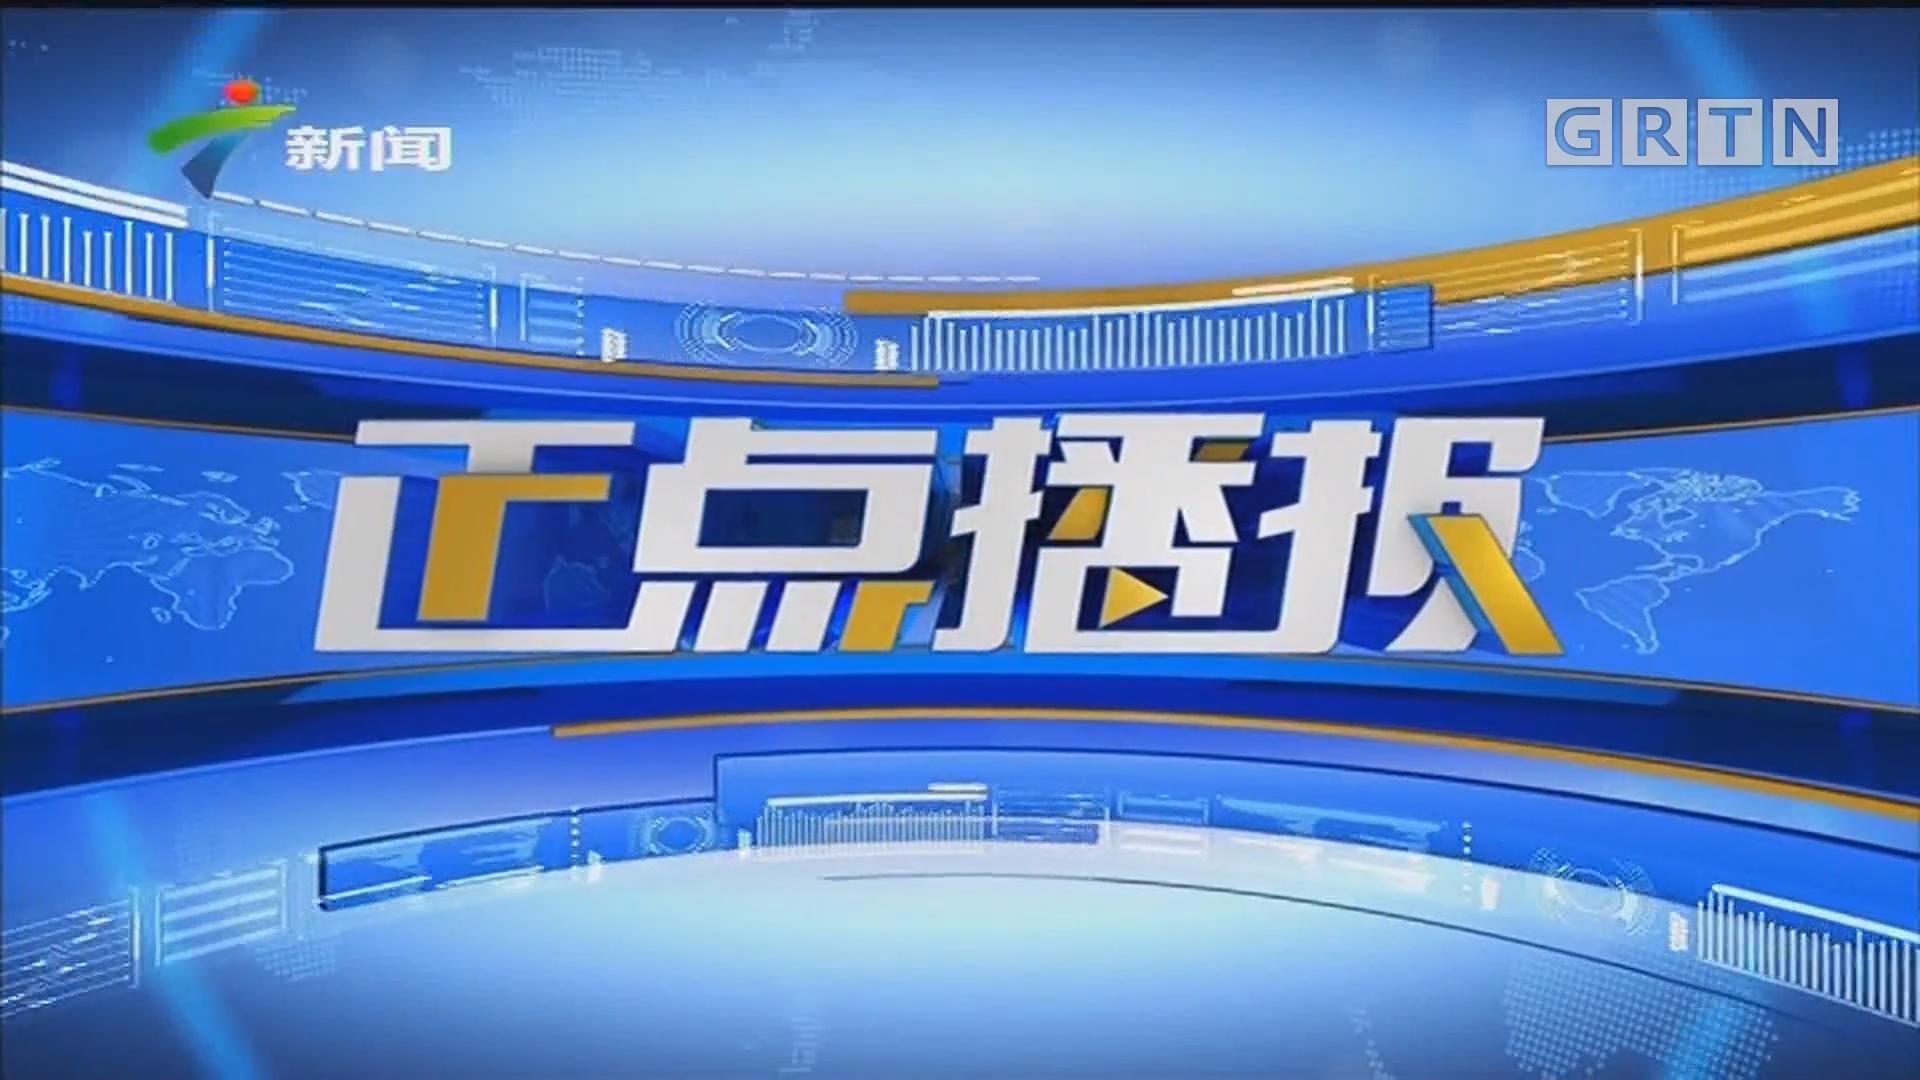 [HD][2019-09-15]正點播報:今天返程車流直擊:深圳惠鹽高速返程車流流量平穩